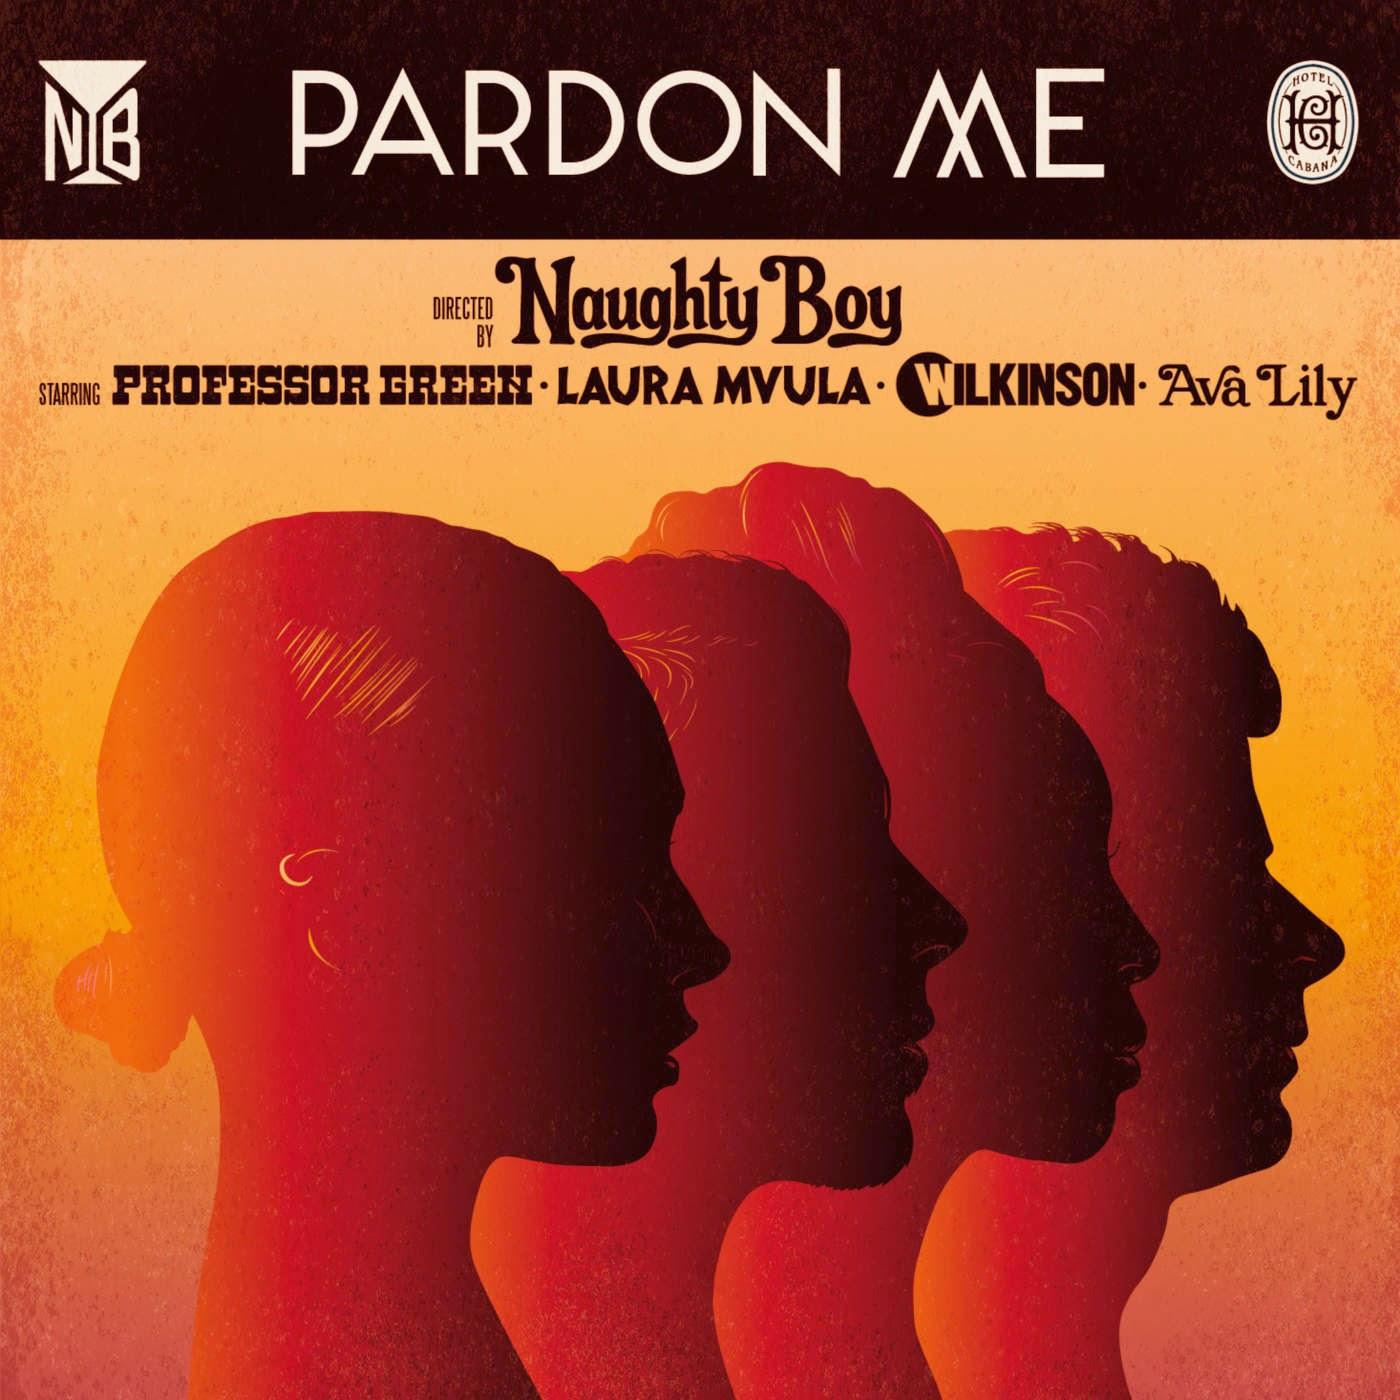 Naughty Boy - Pardon Me (Lynx Peace Edition) [feat. Professor Green, Laura Mvula, Wilkinson & Ava Lily] - Single Cover